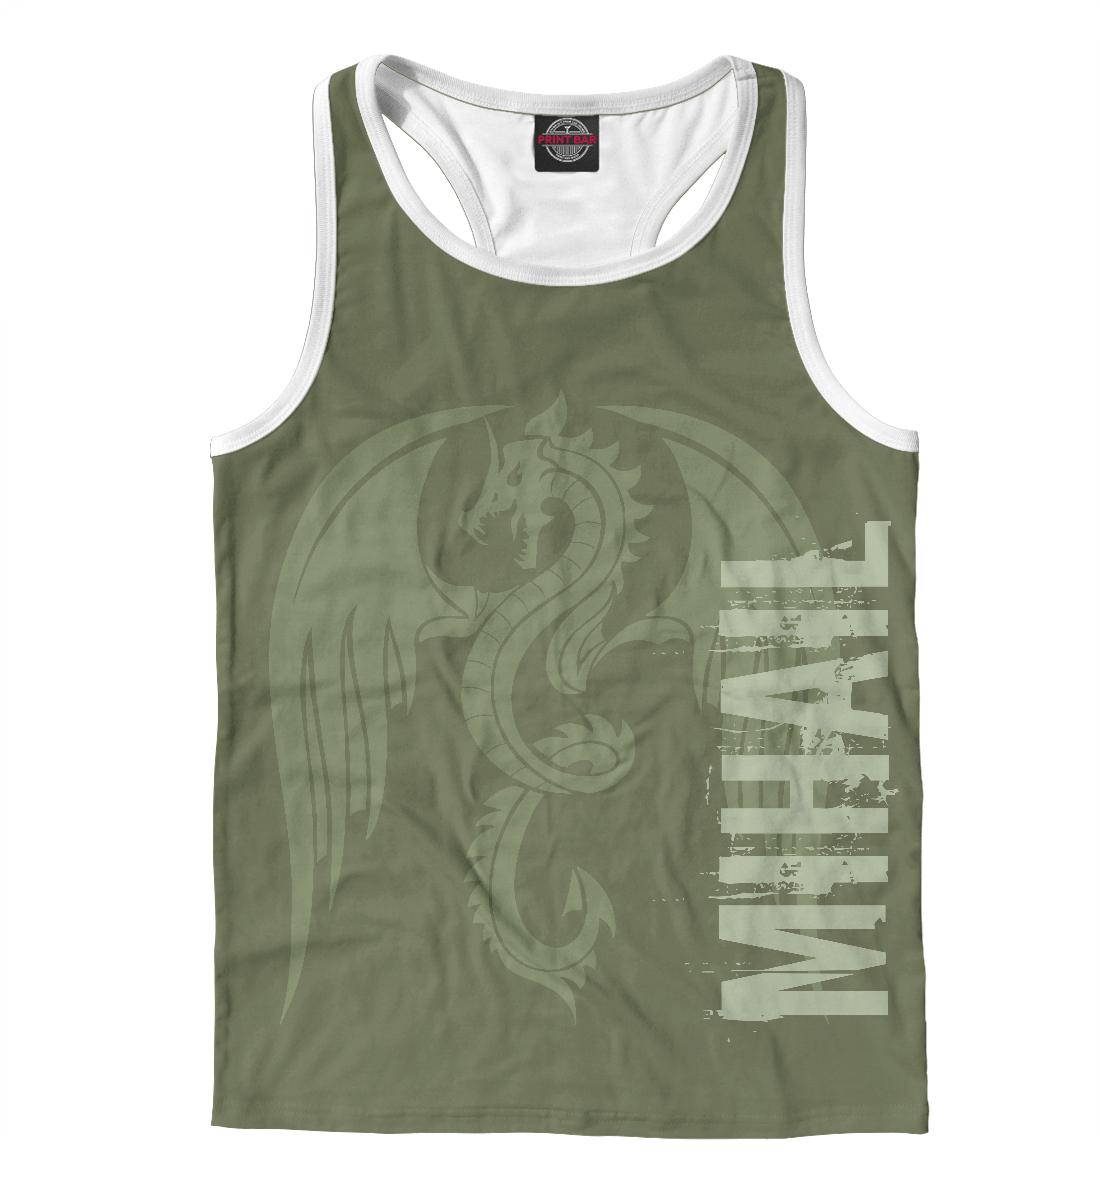 Купить Михаил и дракон, Printbar, Майки борцовки, MCH-814909-mayb-2